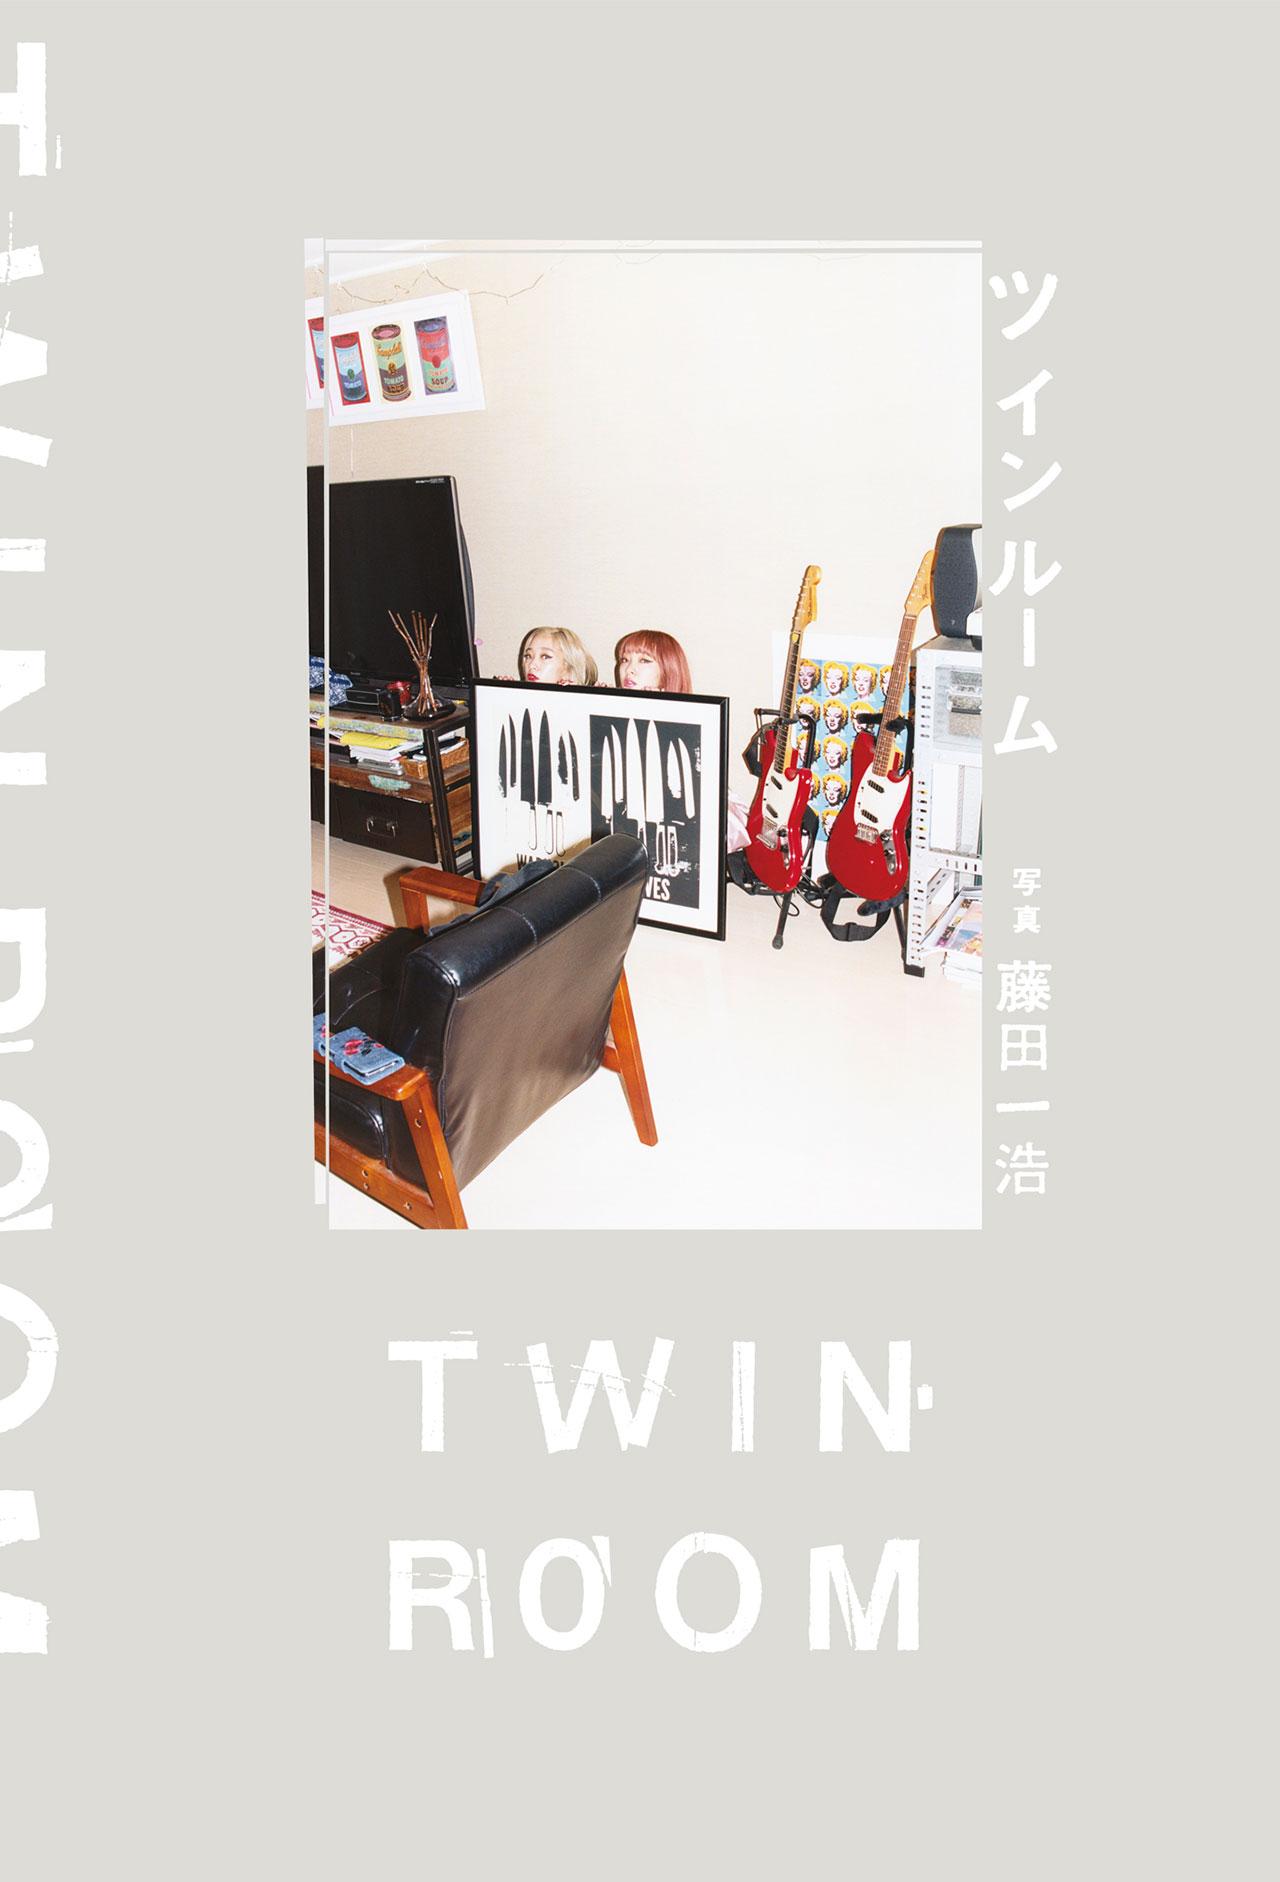 「TWINROOM」¥2,000